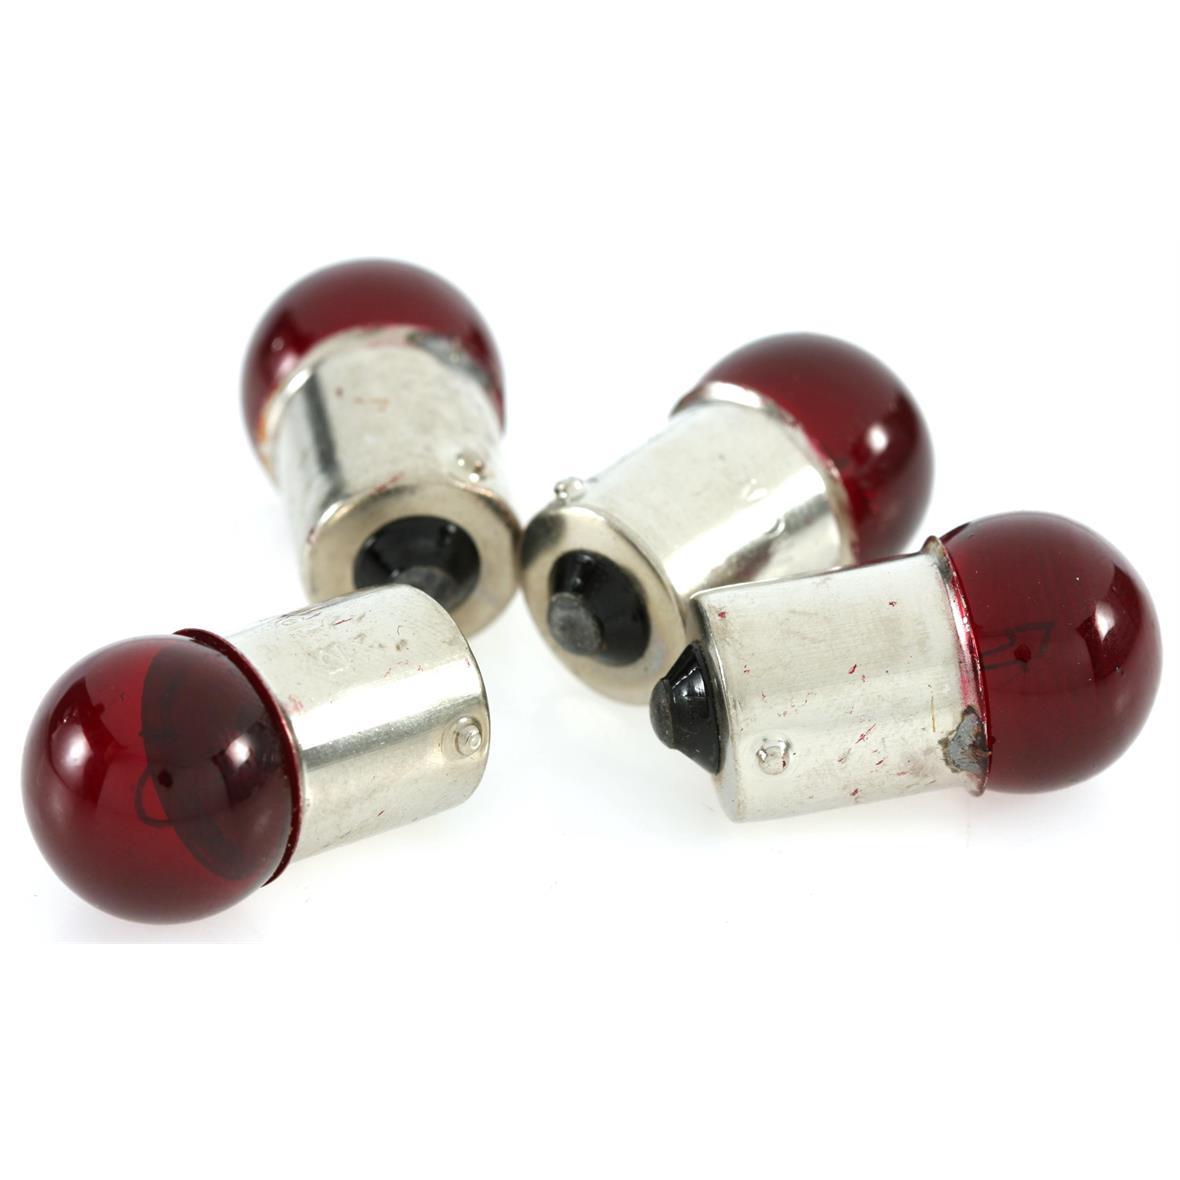 Zdjęcie produktu dla 'Komplet żarówek 12V/10WTitle'